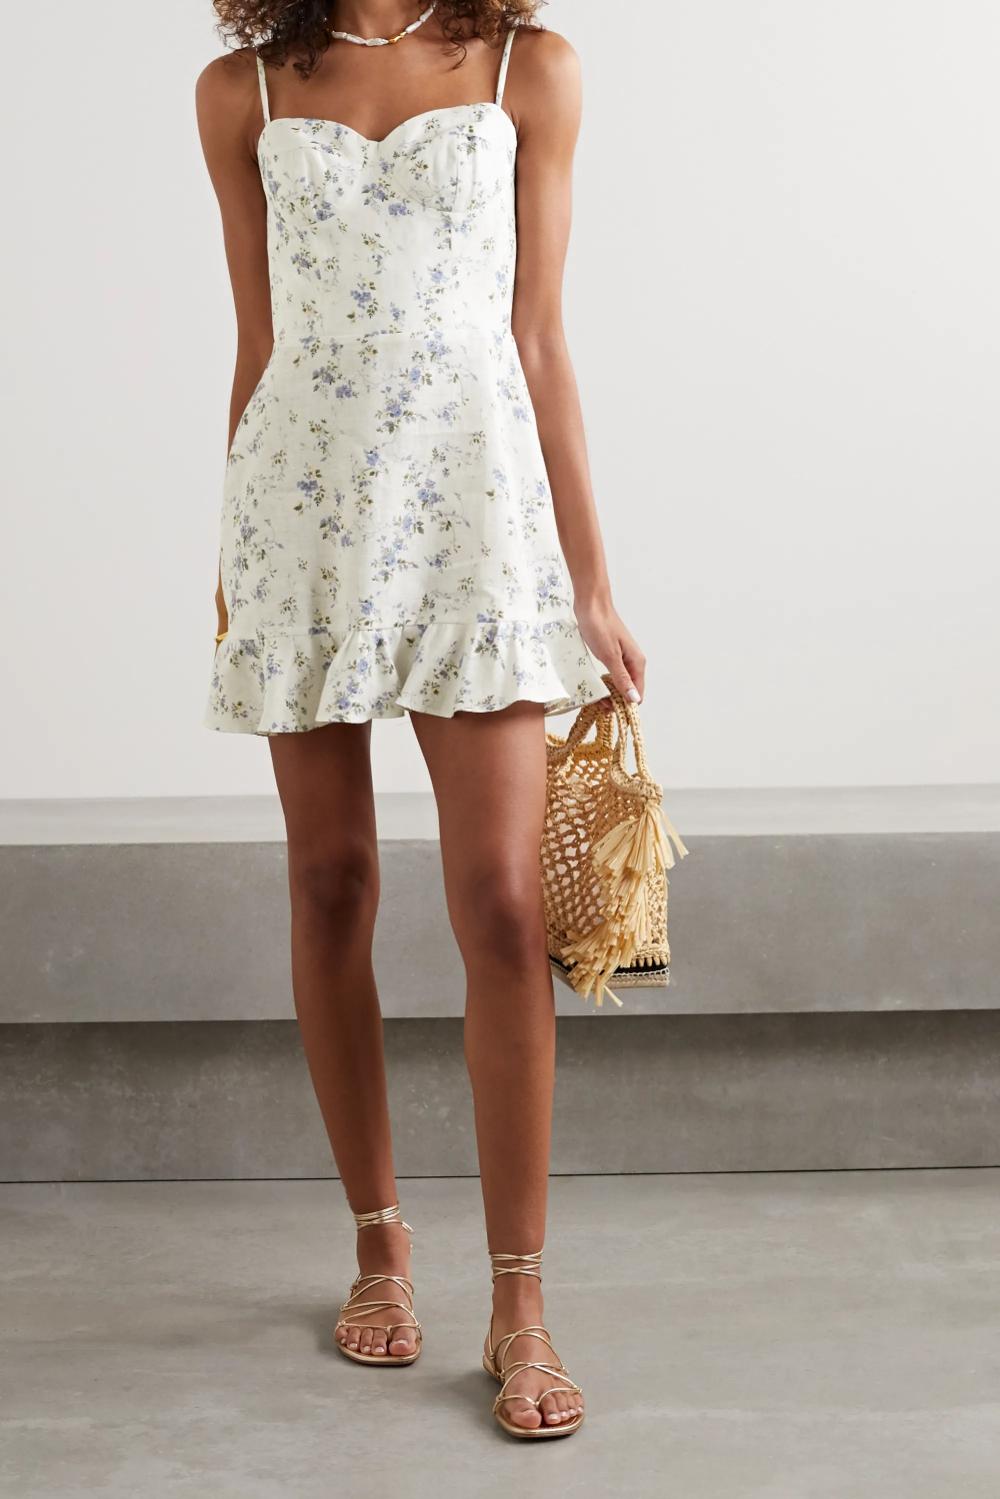 19+ Asos design delicate sequin plunge mini dress with full skirt ideas in 2021